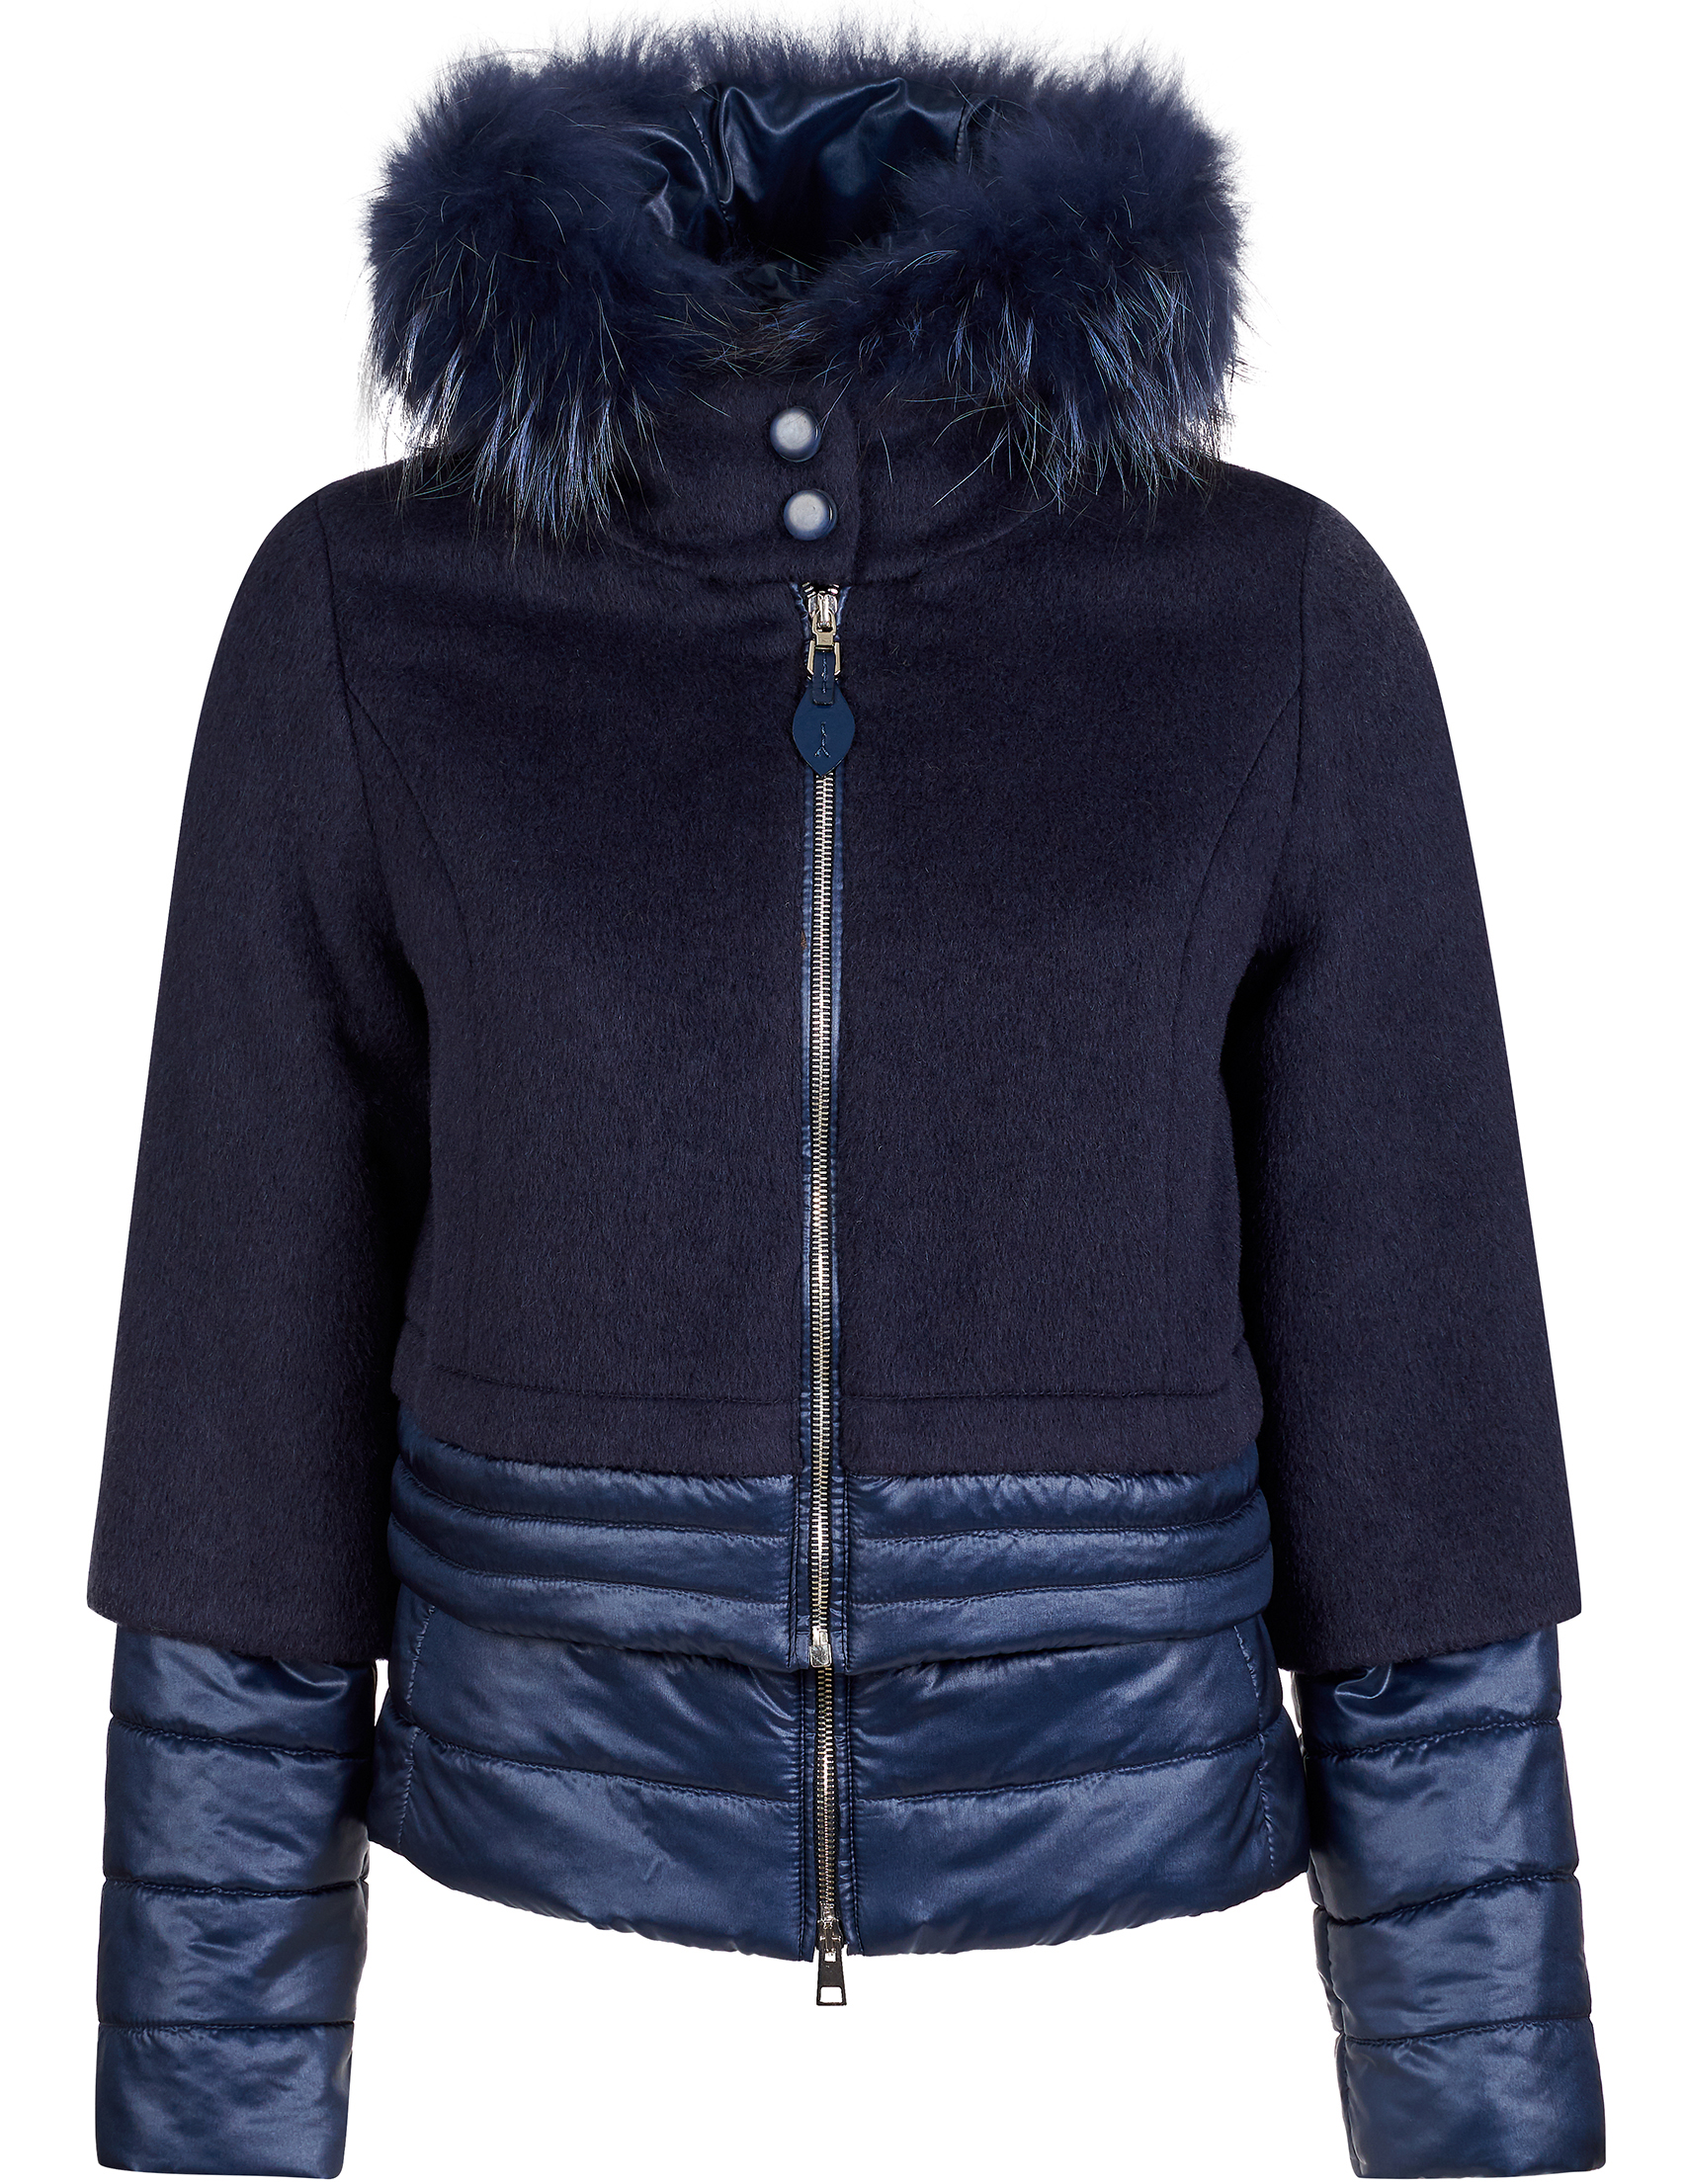 Купить Куртки, Куртка, GALLOTTI, Синий, 100%Полиамид;100%Полиэстер;43%Альпака 37%Шерсть 20%Полиамид;100%Мех, Осень-Зима